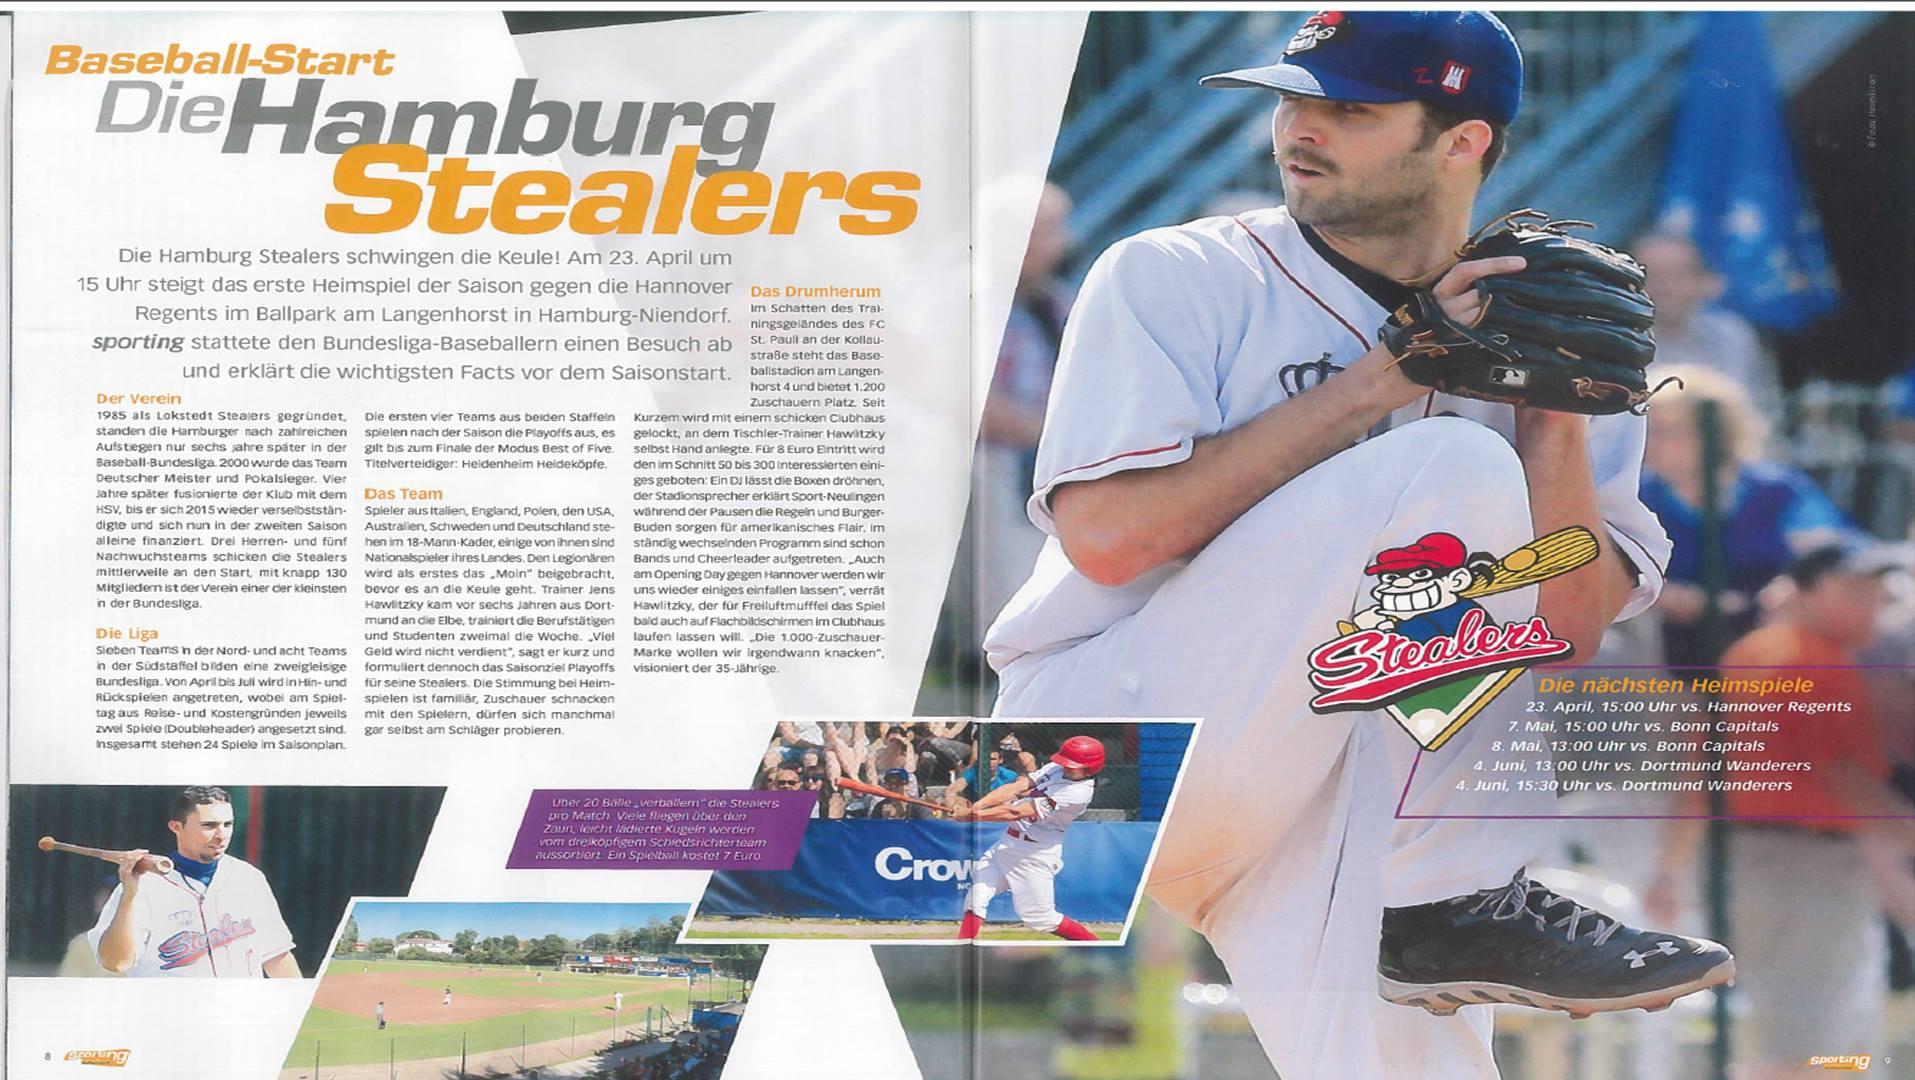 Sporting Hamburg, 6.4.2016 Baseballstart Die Hamburg Stealers